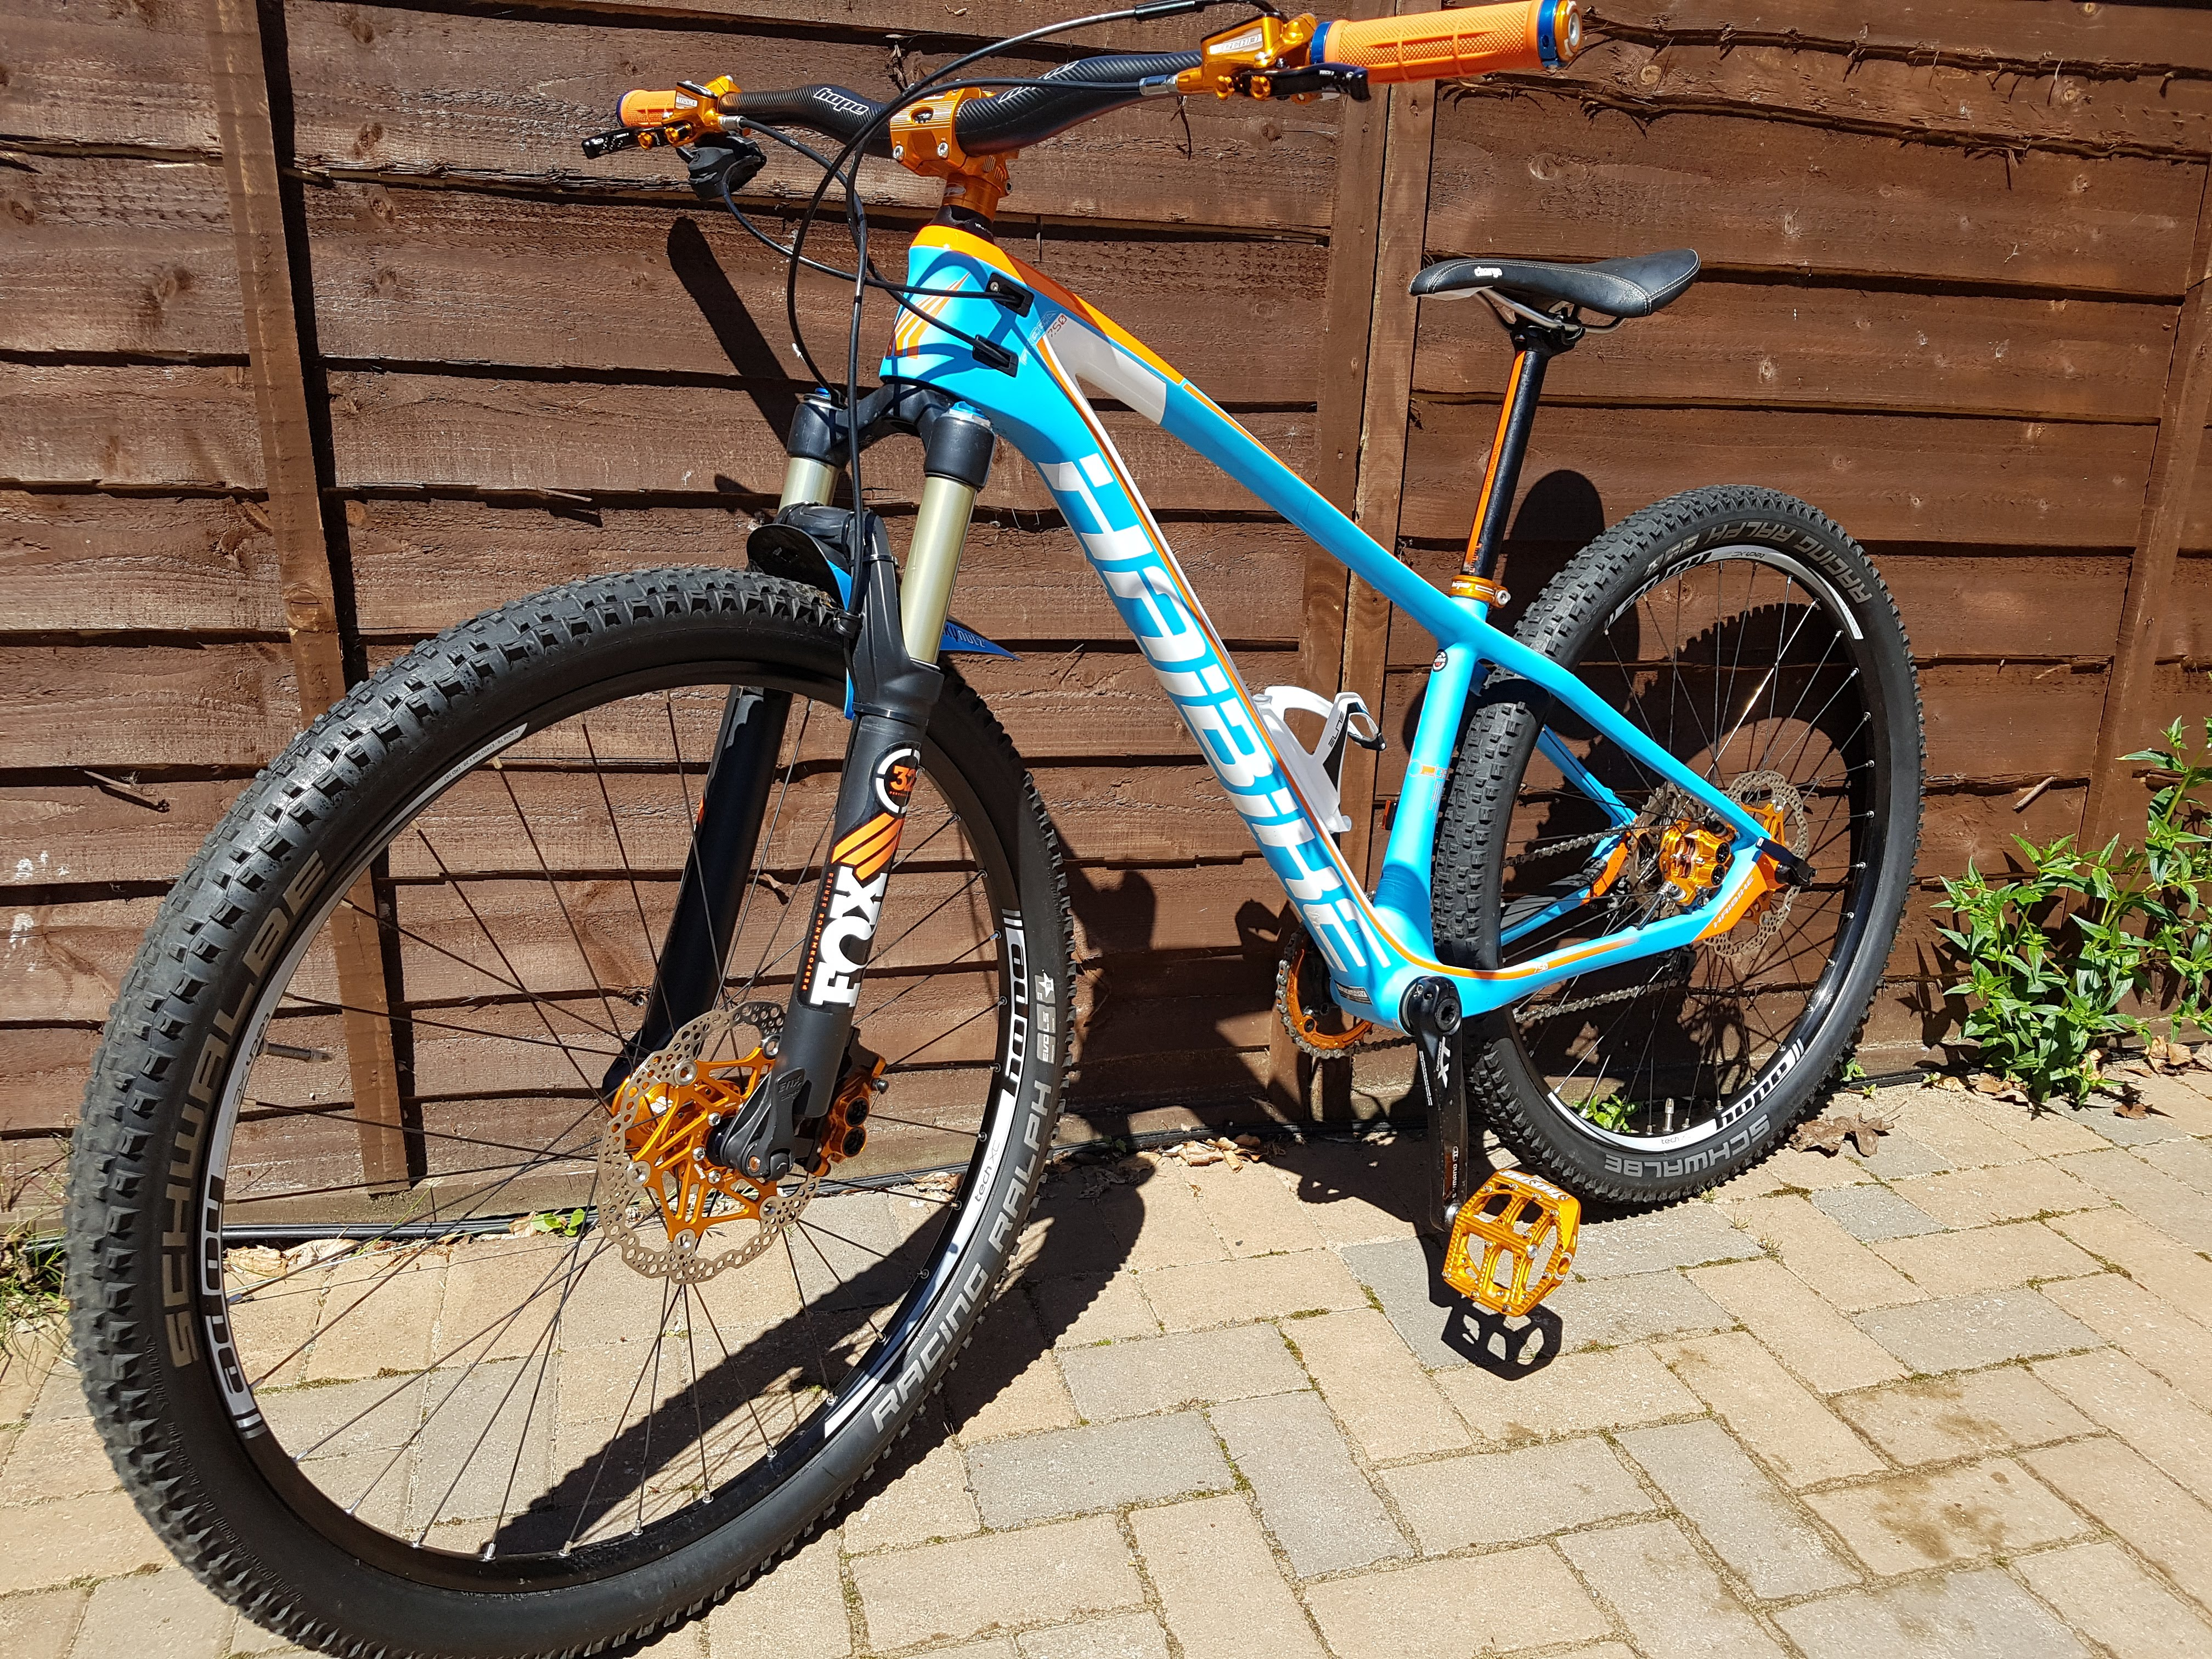 Горный велосипед haibike edition 7. 50 youtube.